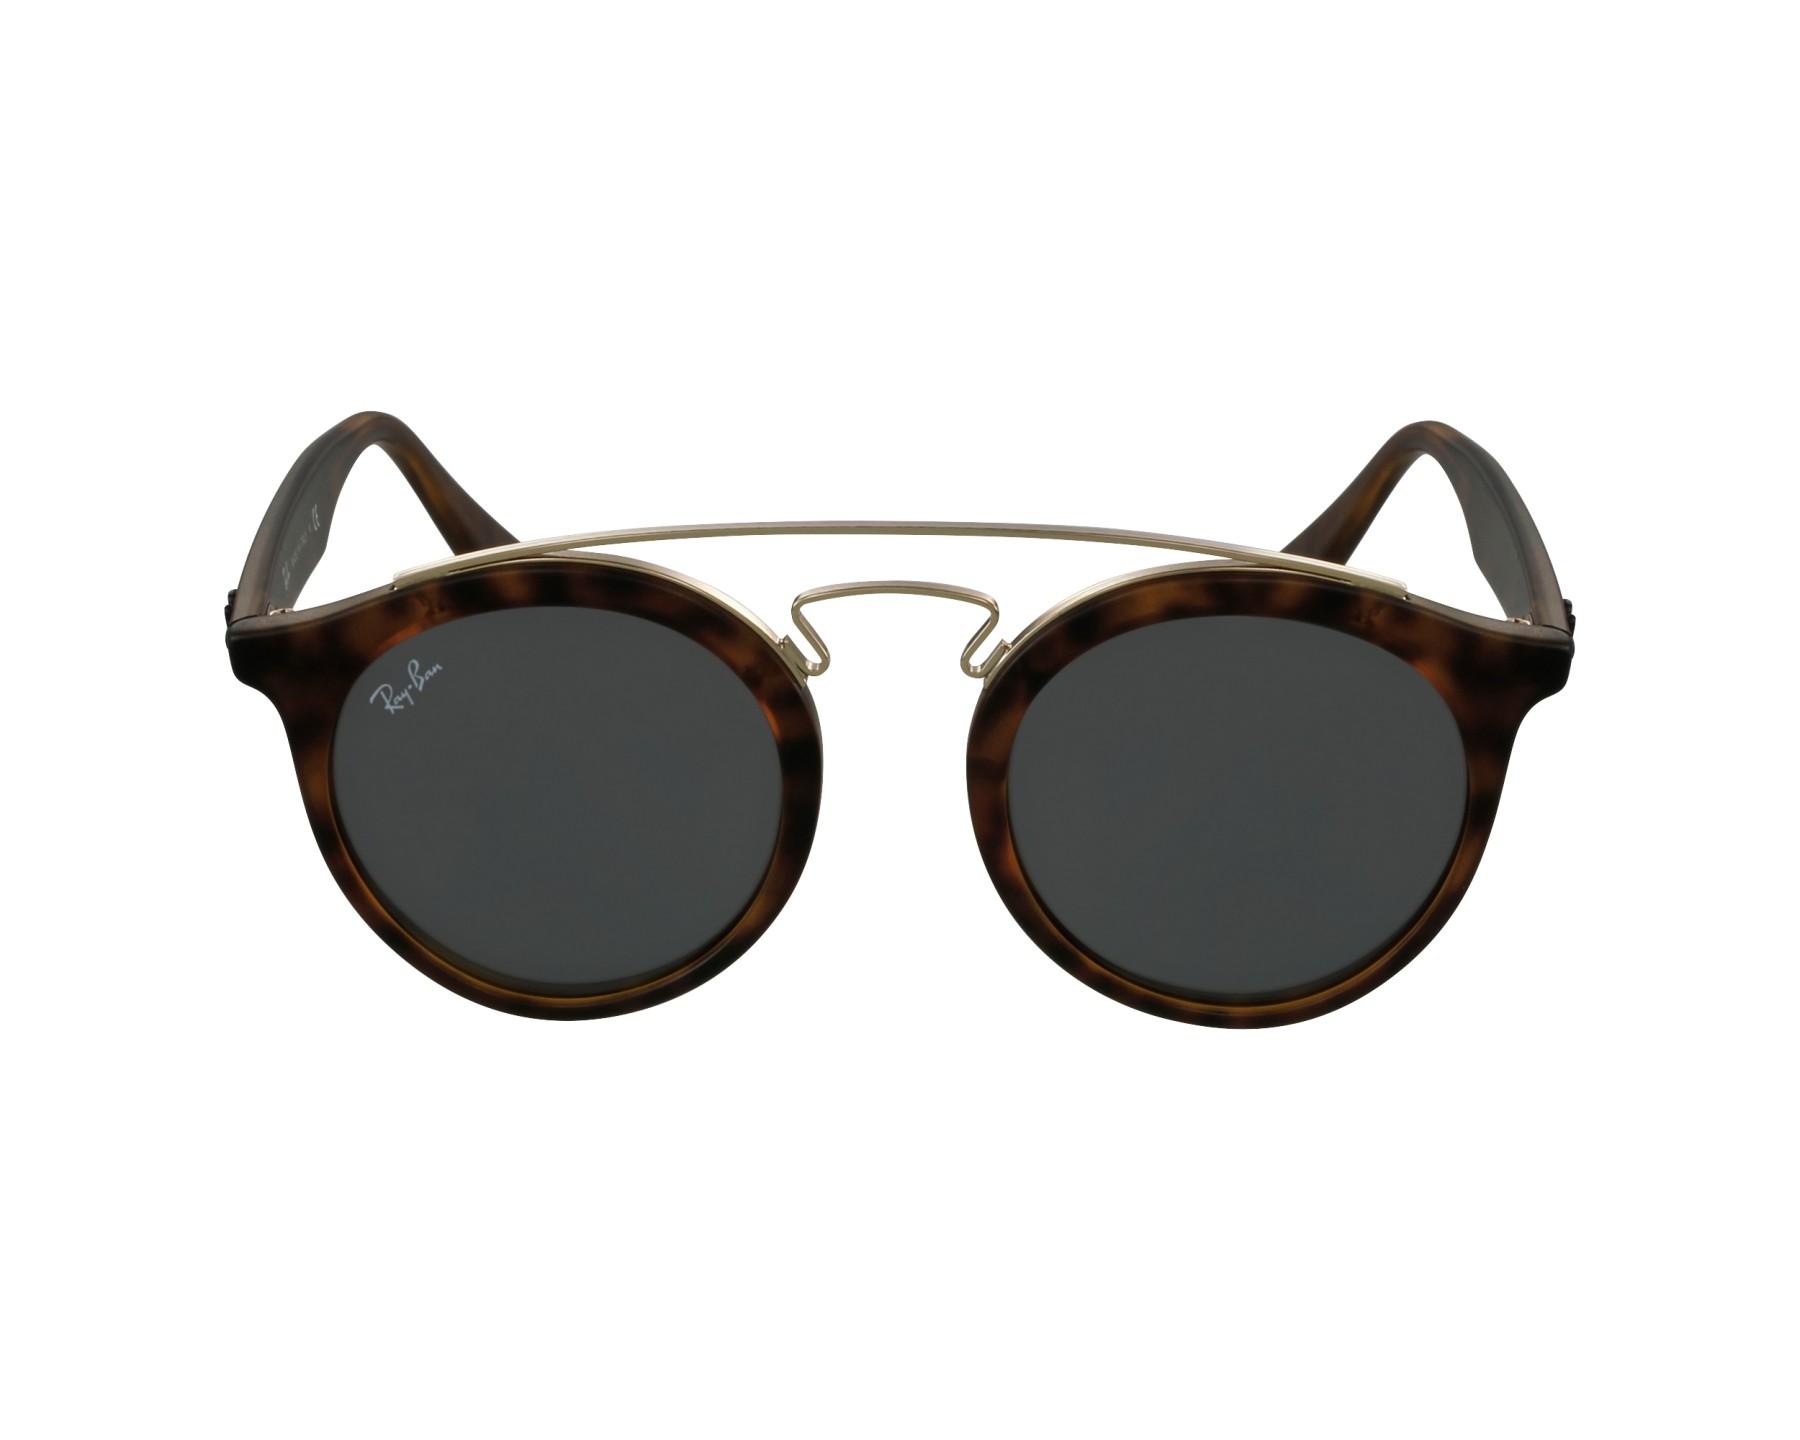 Sunglasses Ray-Ban RB-4256 6092 6G 46-20 Havana Gold profile 6c1197bb5a65